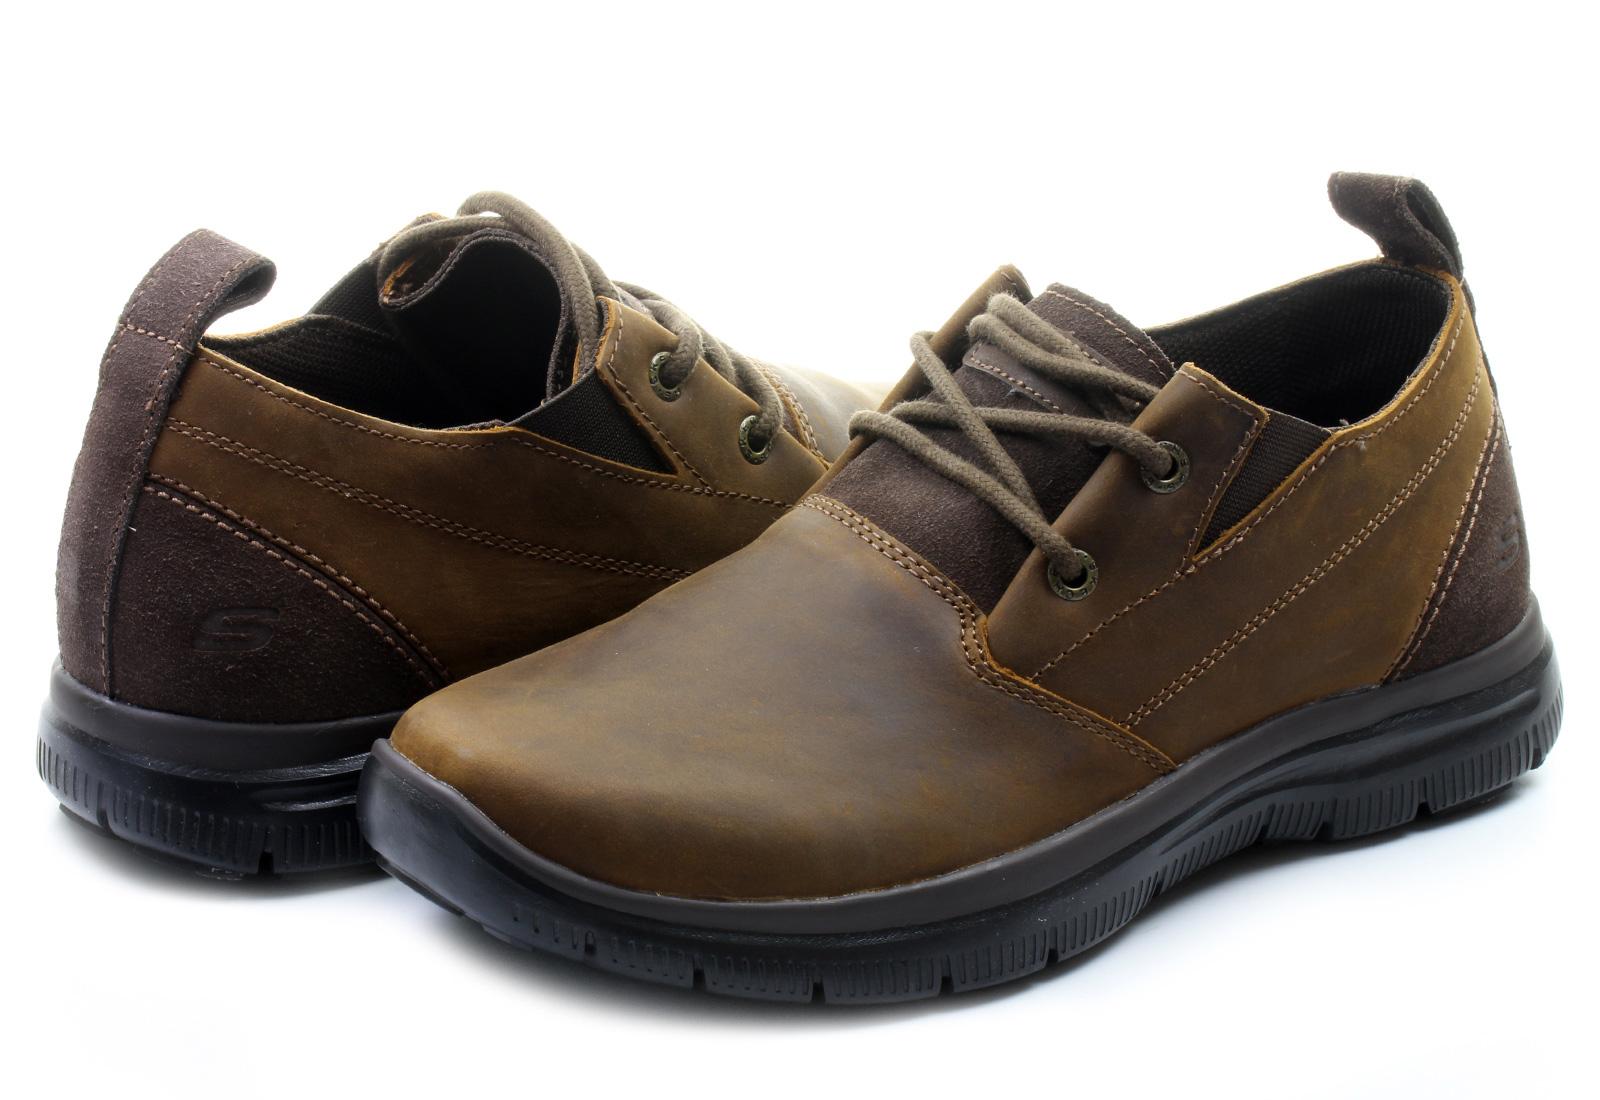 6815e832ae Skechers Cipő - Hinton- Boley - 64541-cdb - Office Shoes Magyarország